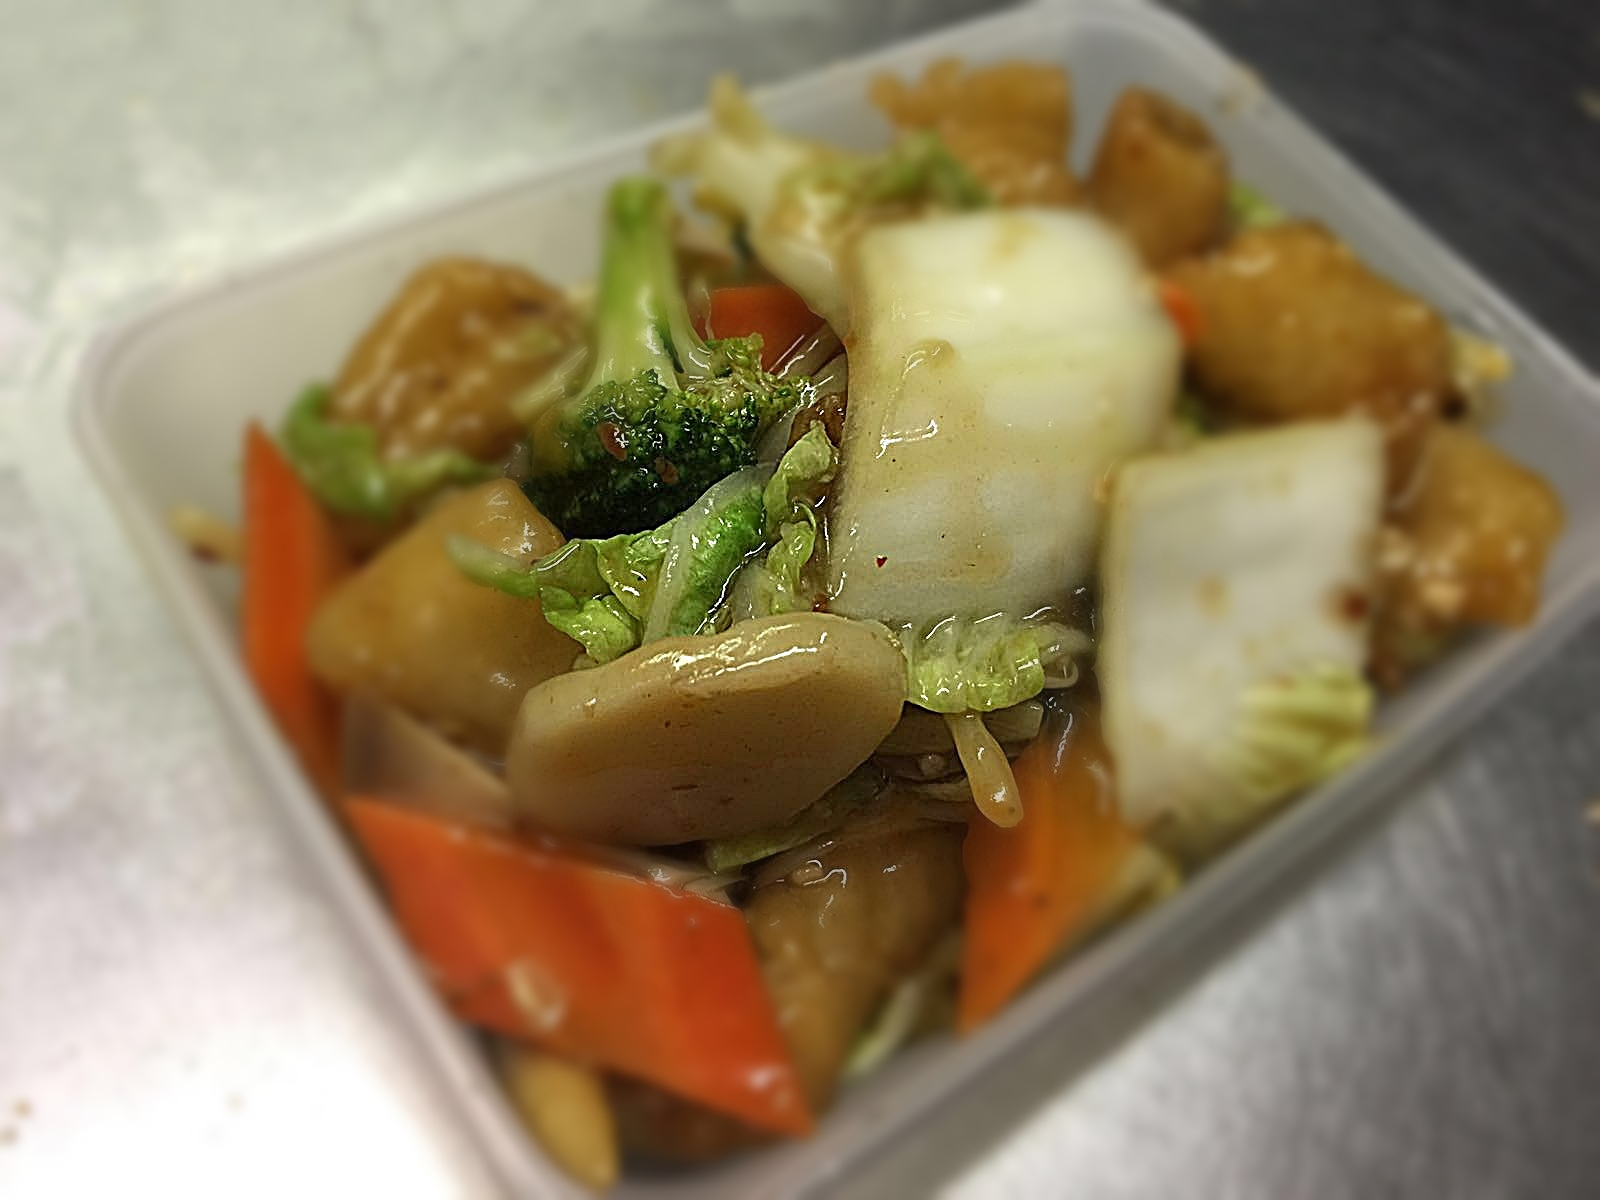 Fish & Mixed Vegetables